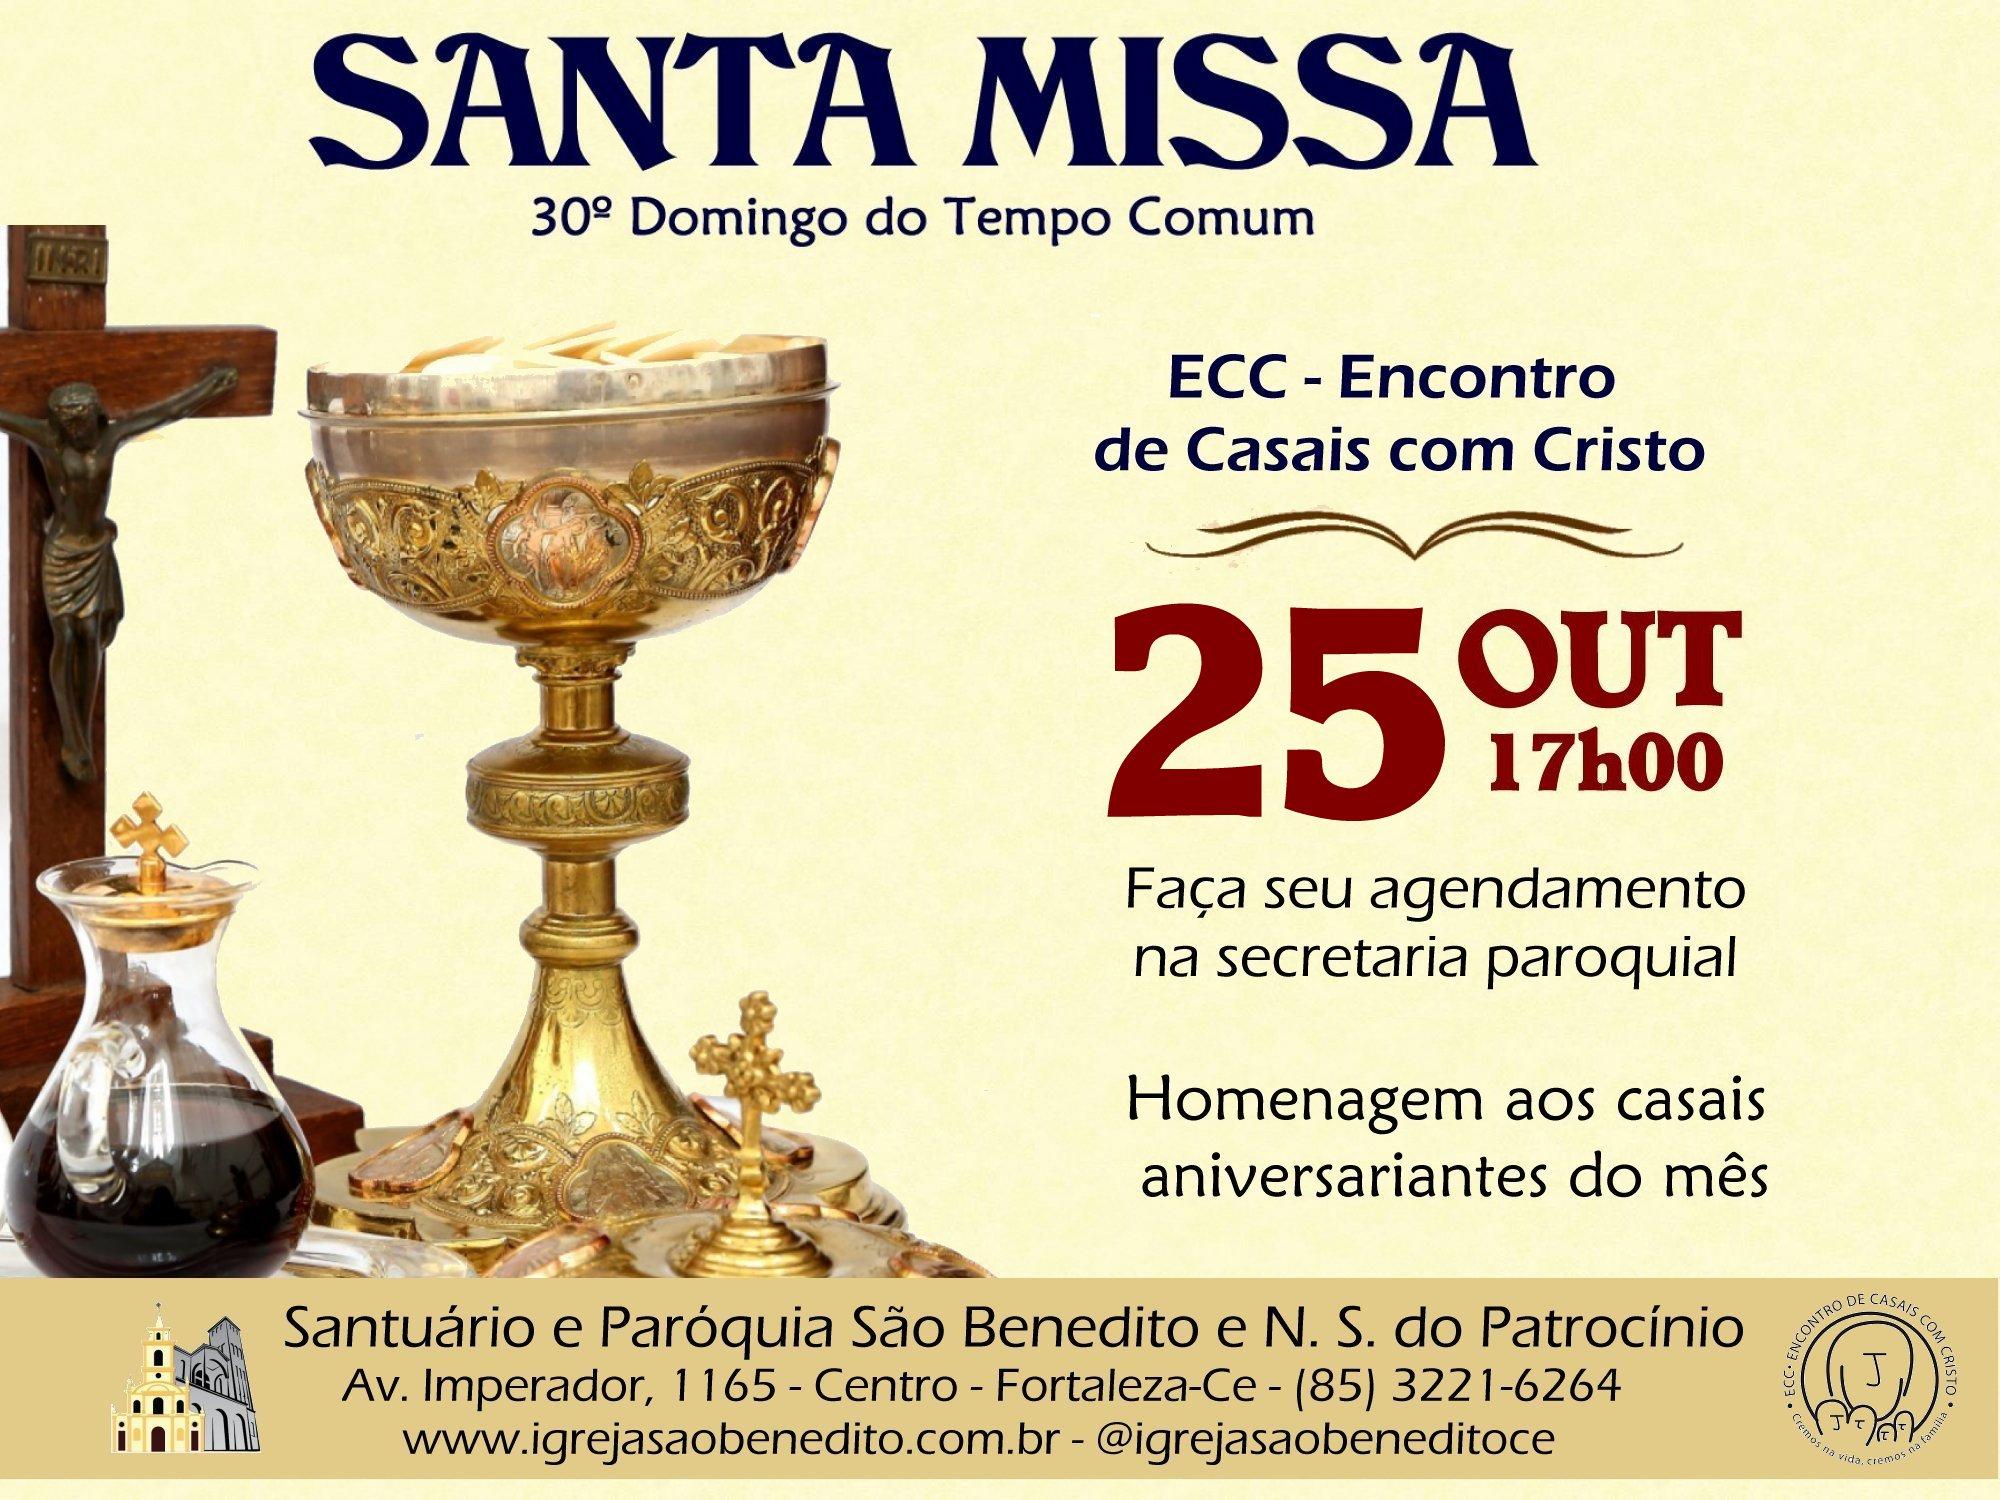 ECC – Encontro de Casais com Cristo convida para Santa Missa do mês de Outubro. Participe!